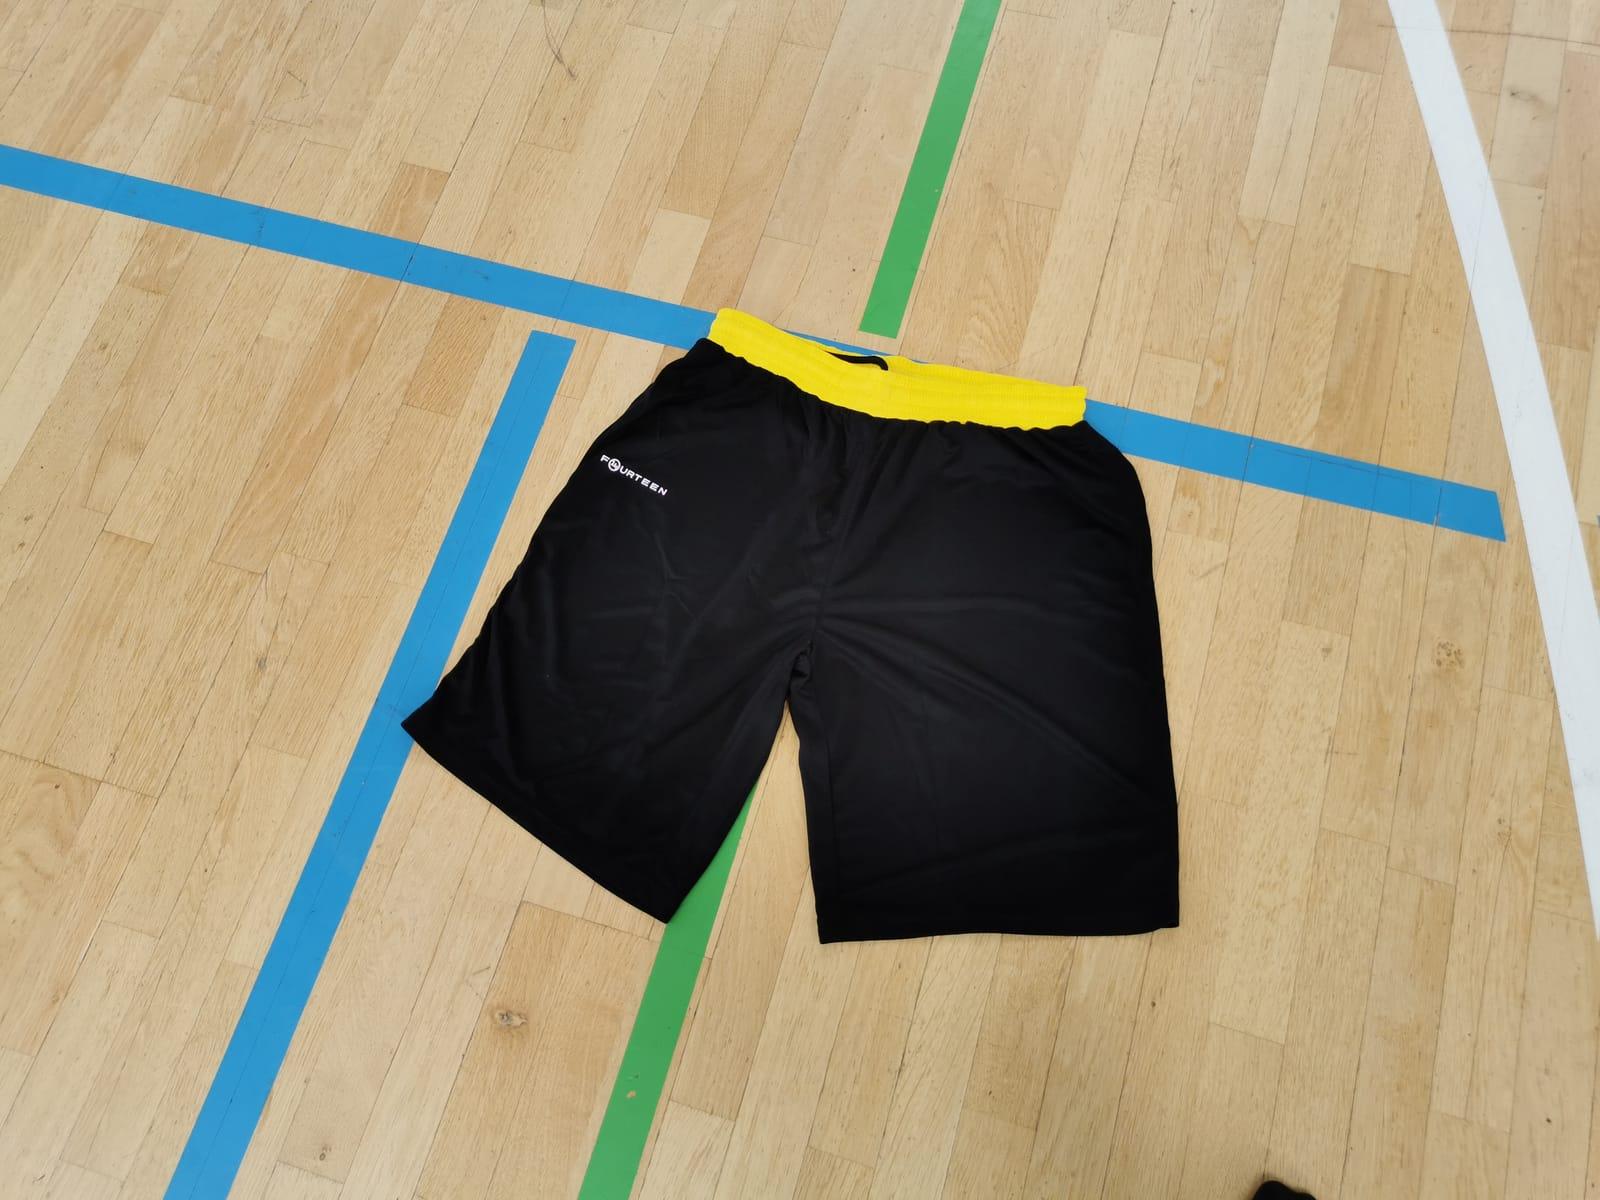 Original Trainings-Short aus der Teamwear